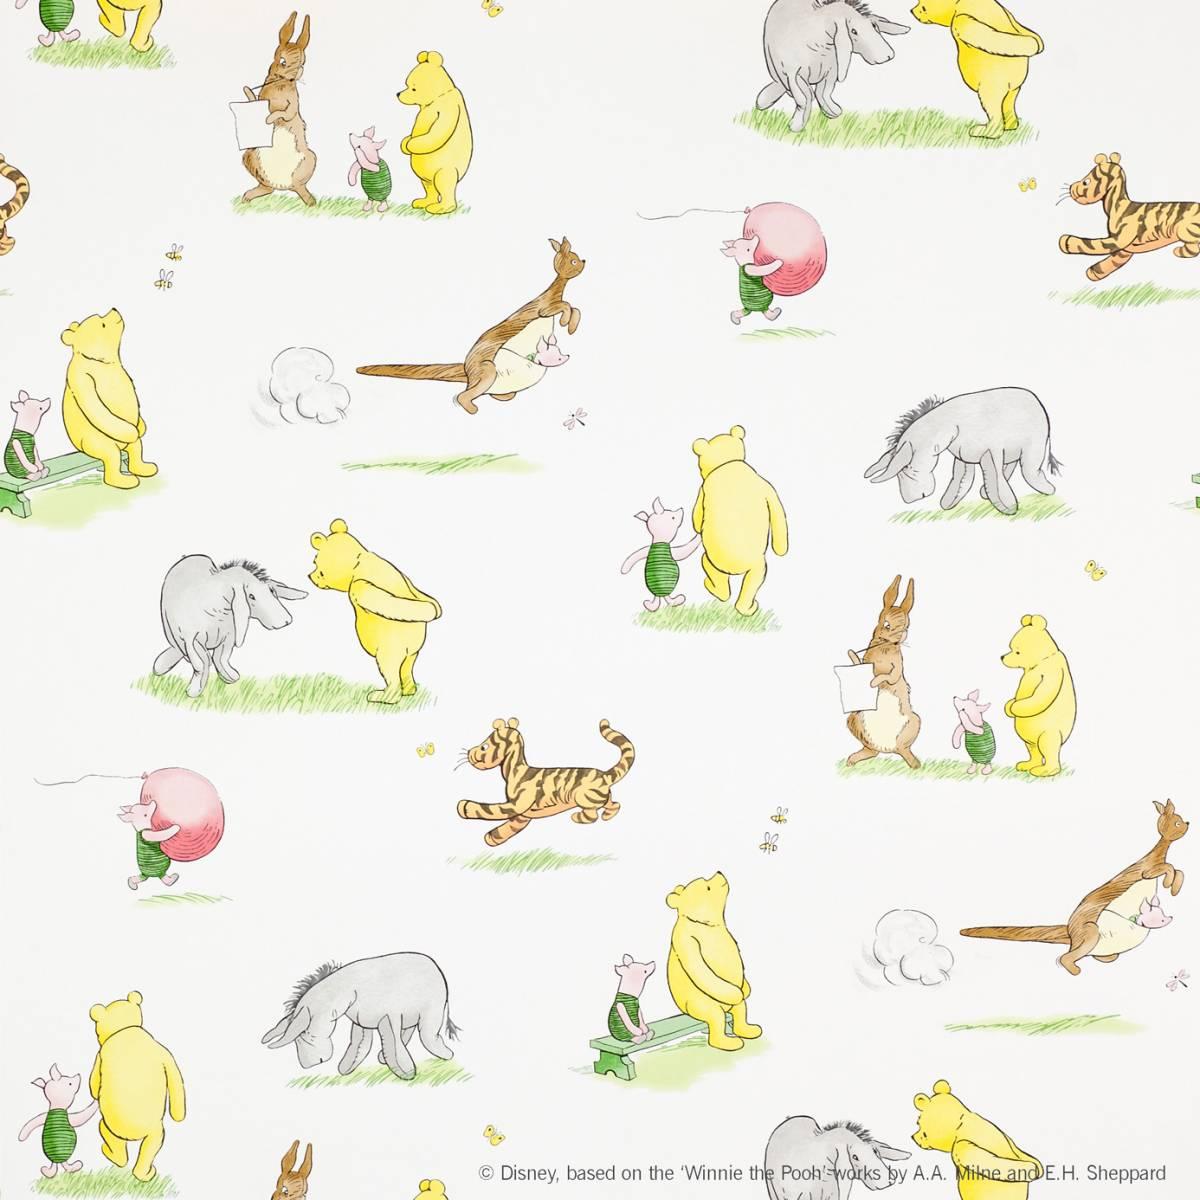 Wallpaper Winnie The Pooh: Winnie The Pooh And Friends Wallpaper